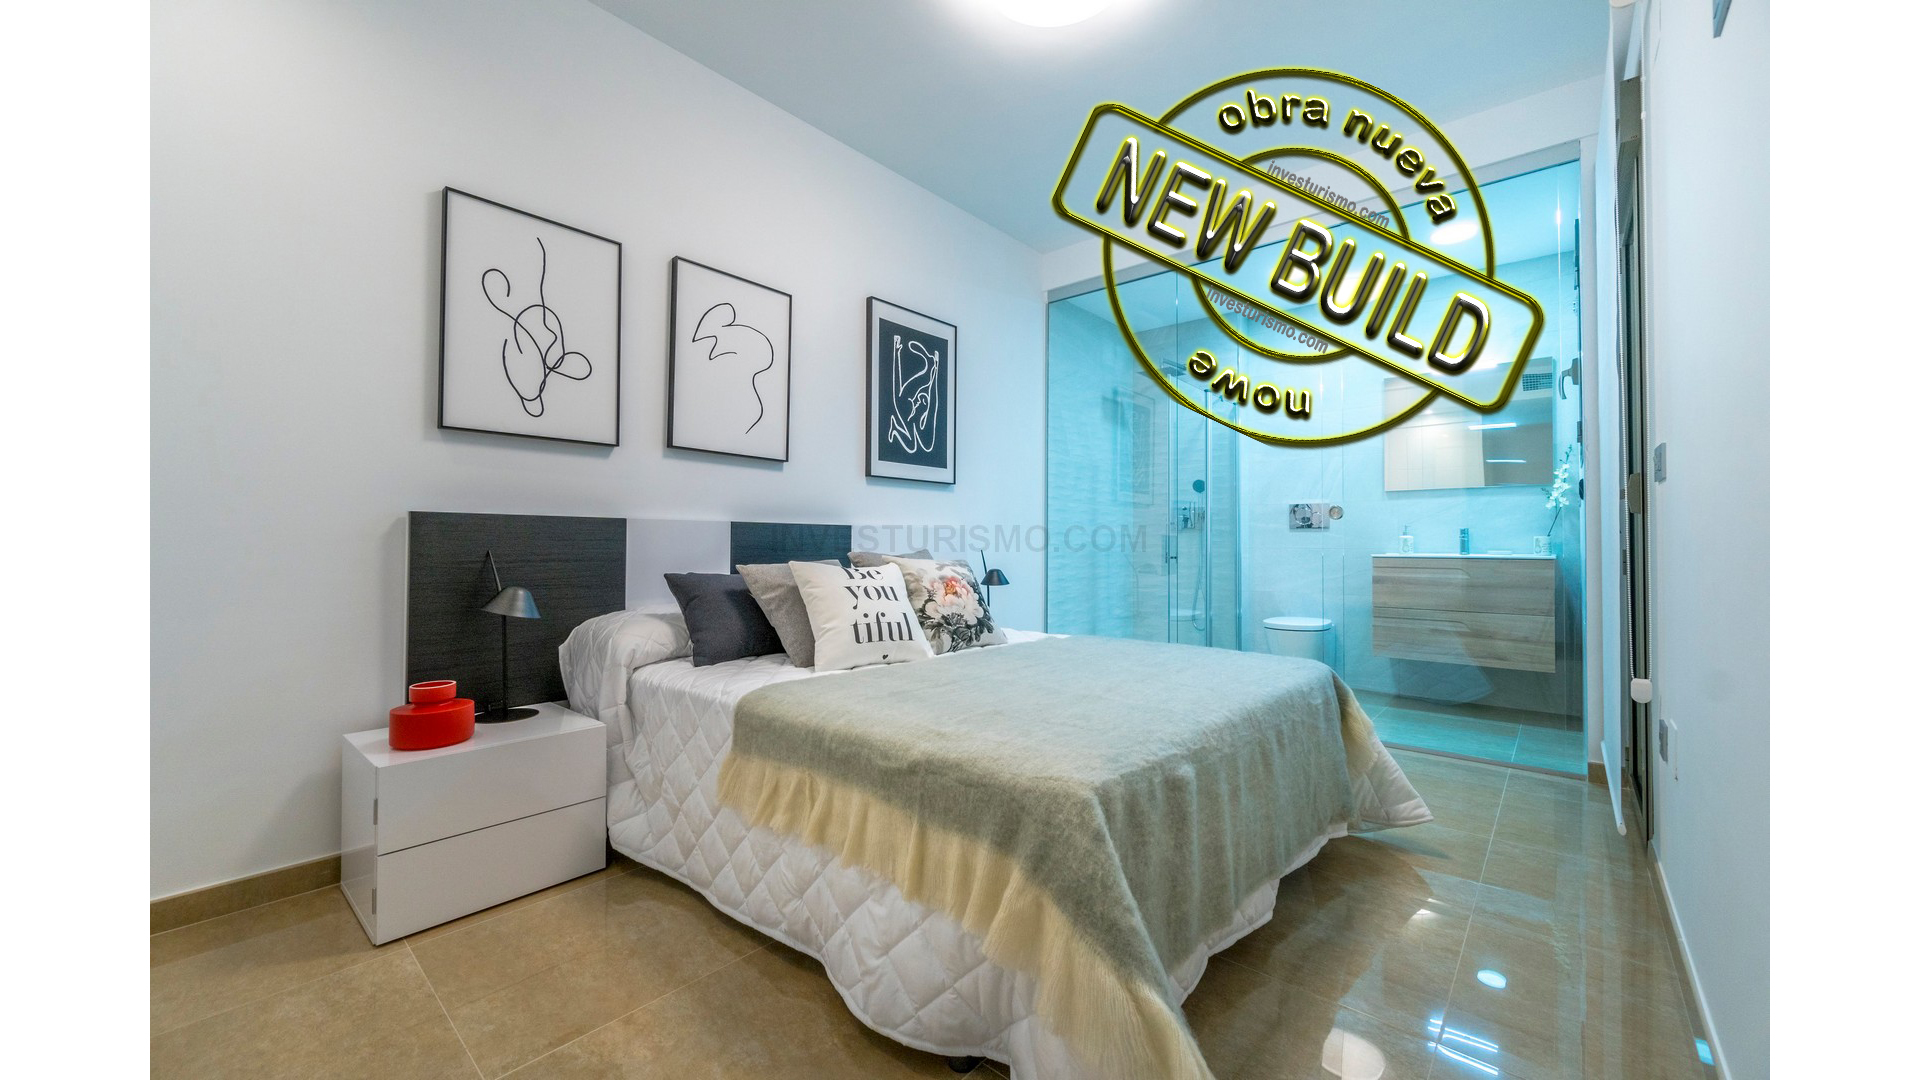 New build apartments 3 bedrooms 2 bathrooms in Torrevieja